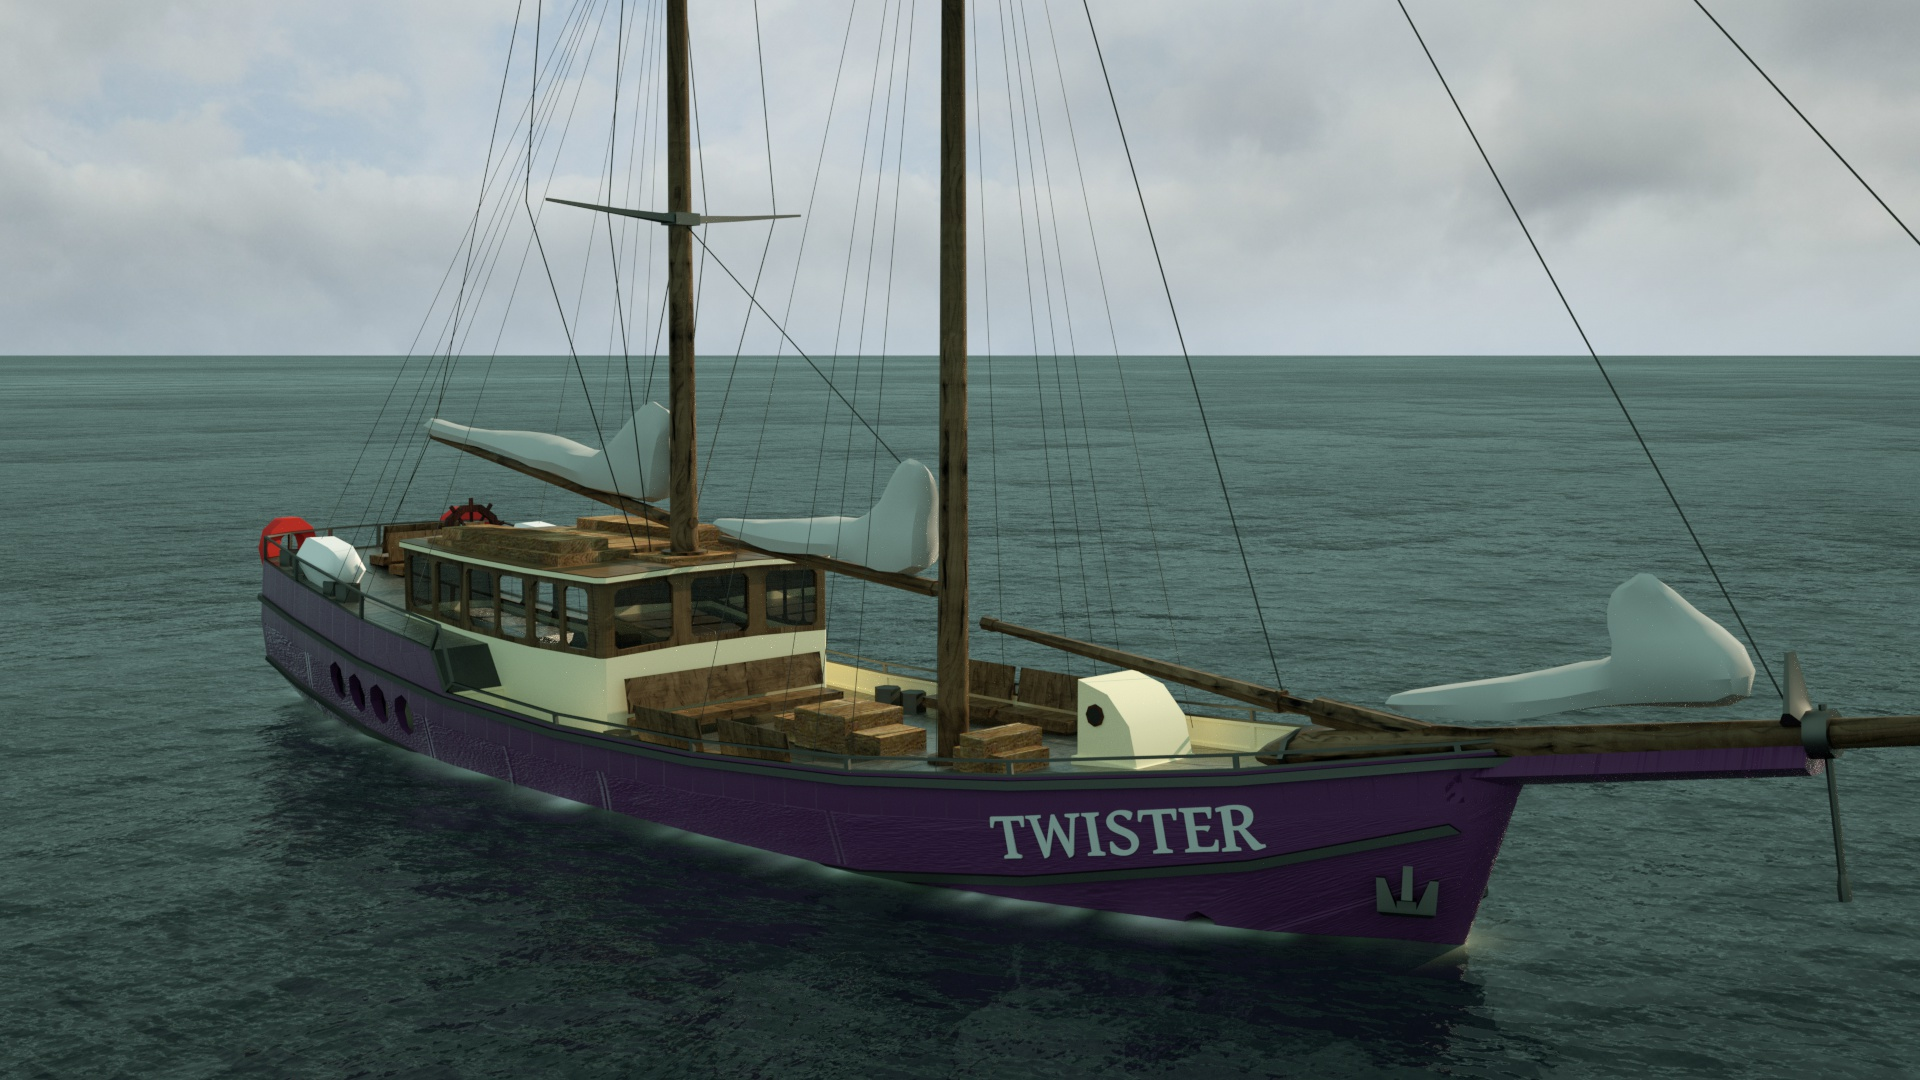 Twister_1.jpg